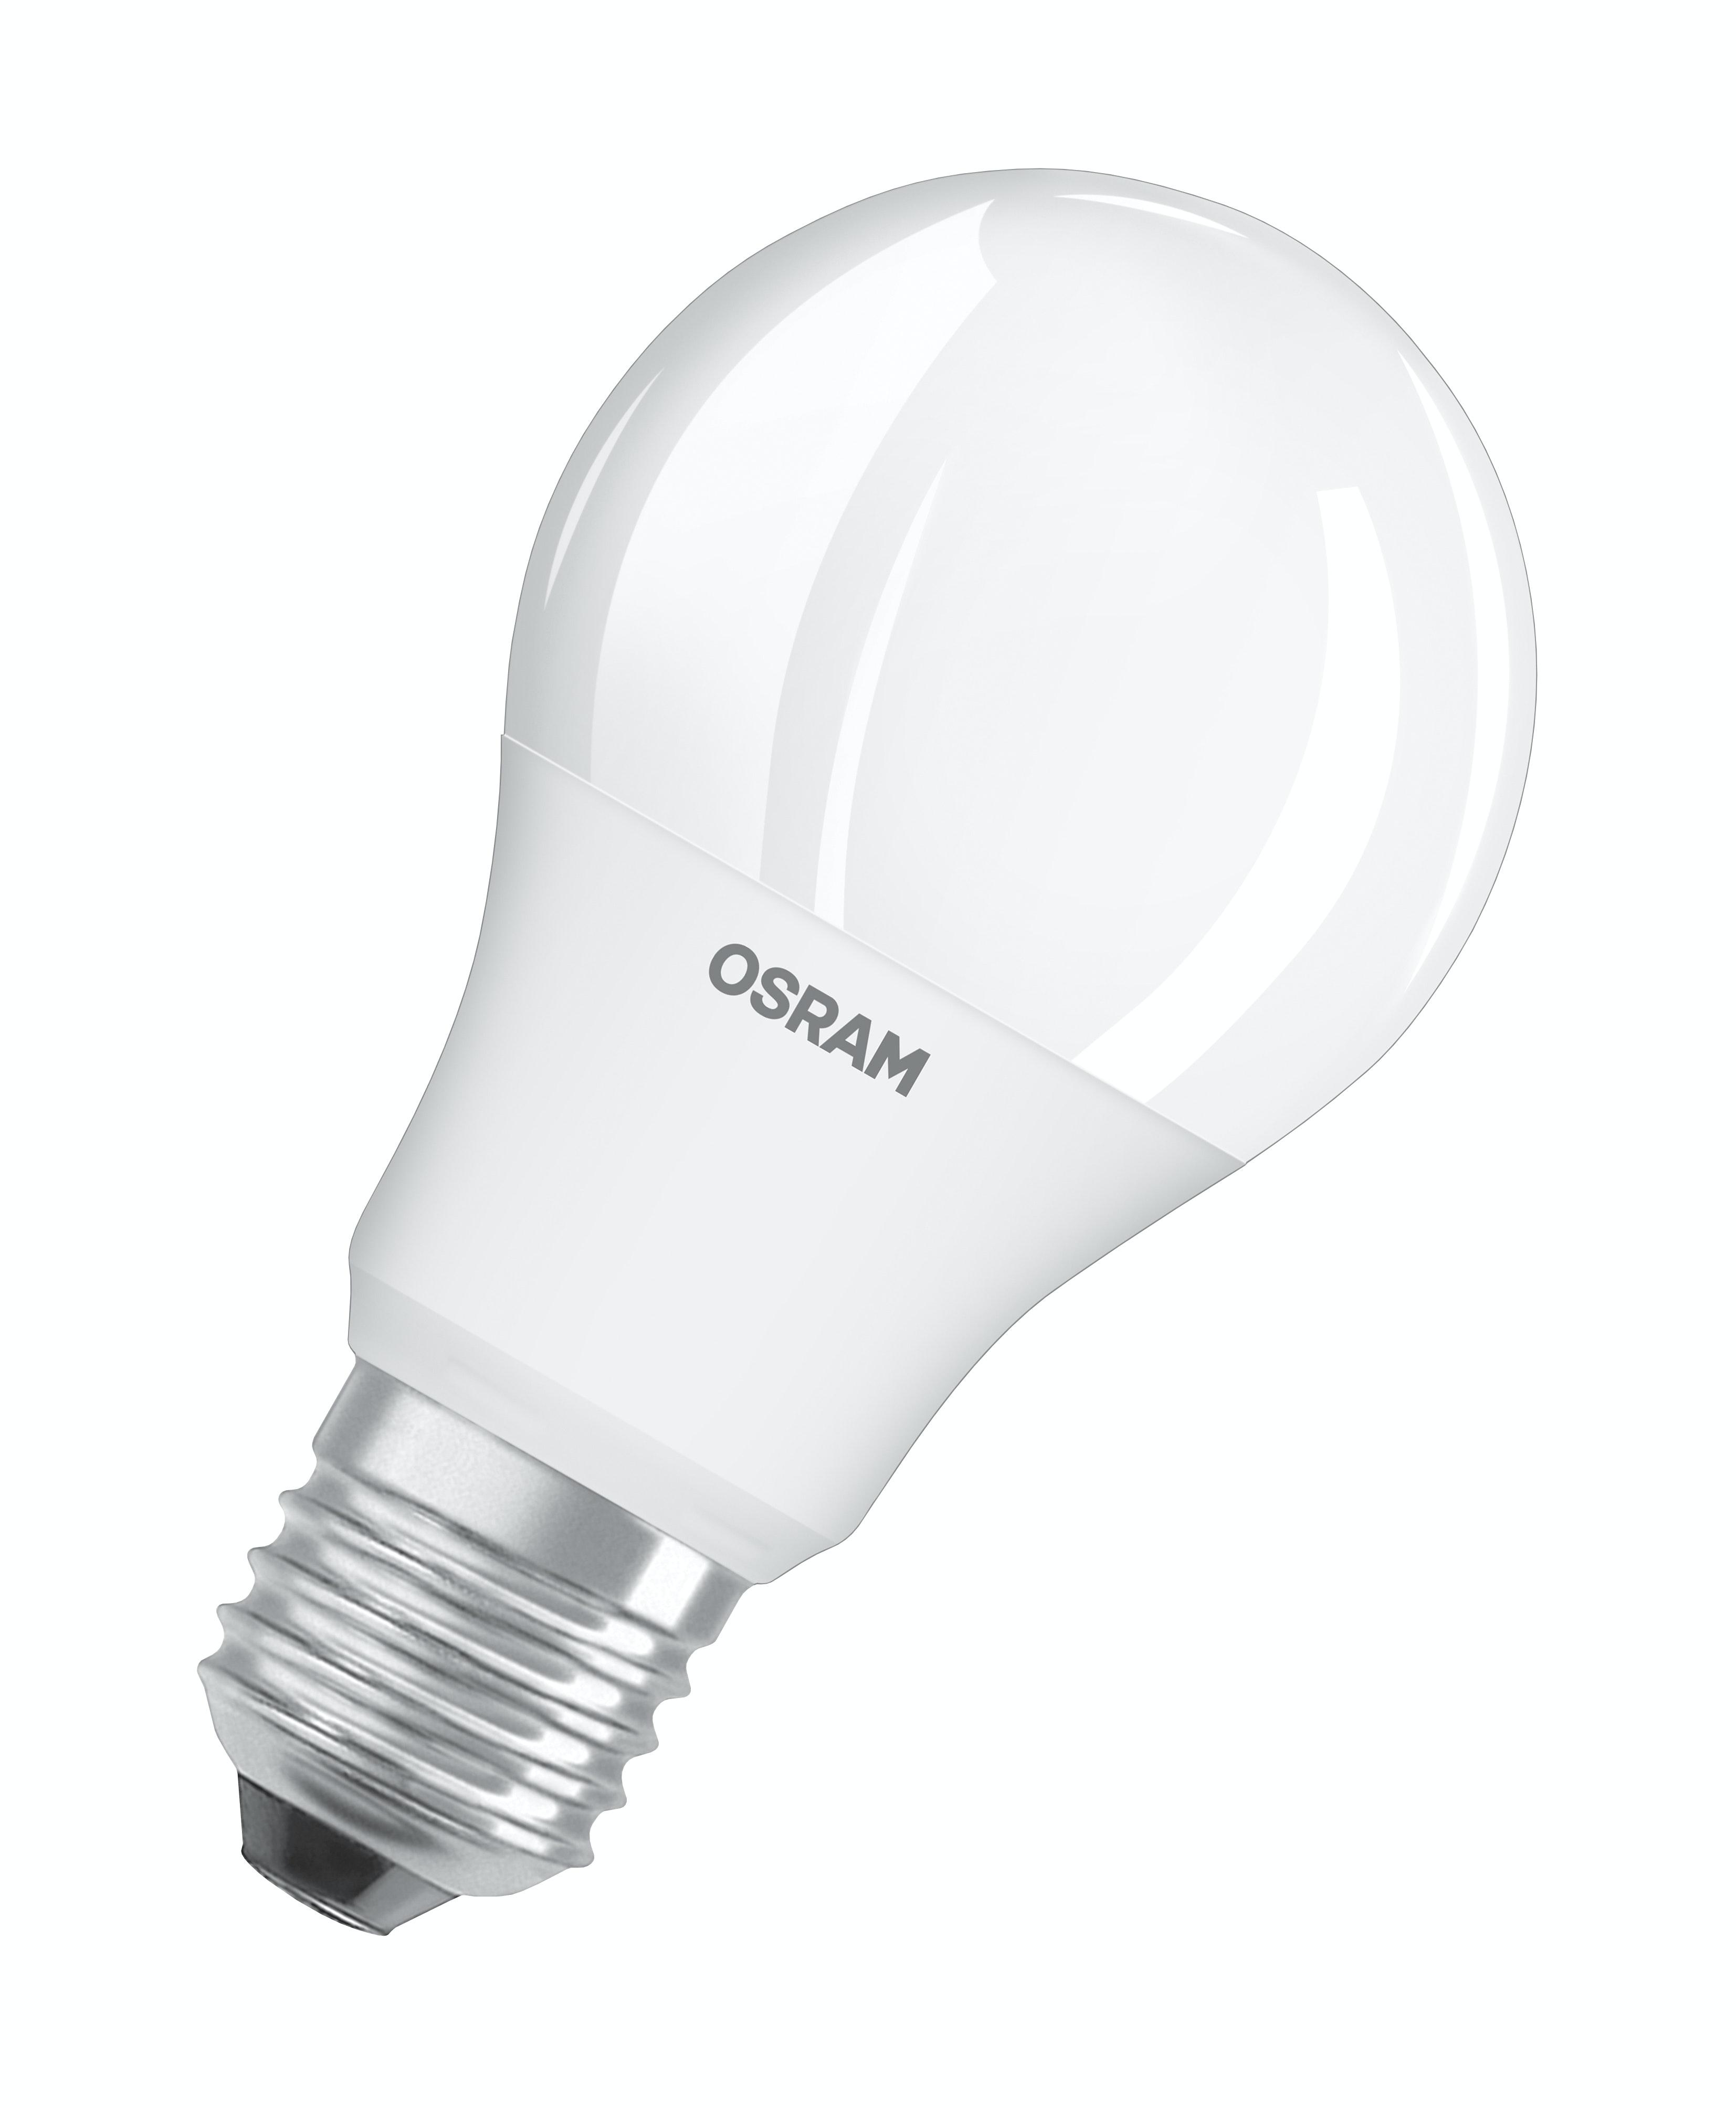 Led-lampa Osram SST Glowdim CLA60 Normal Matt E27 10W